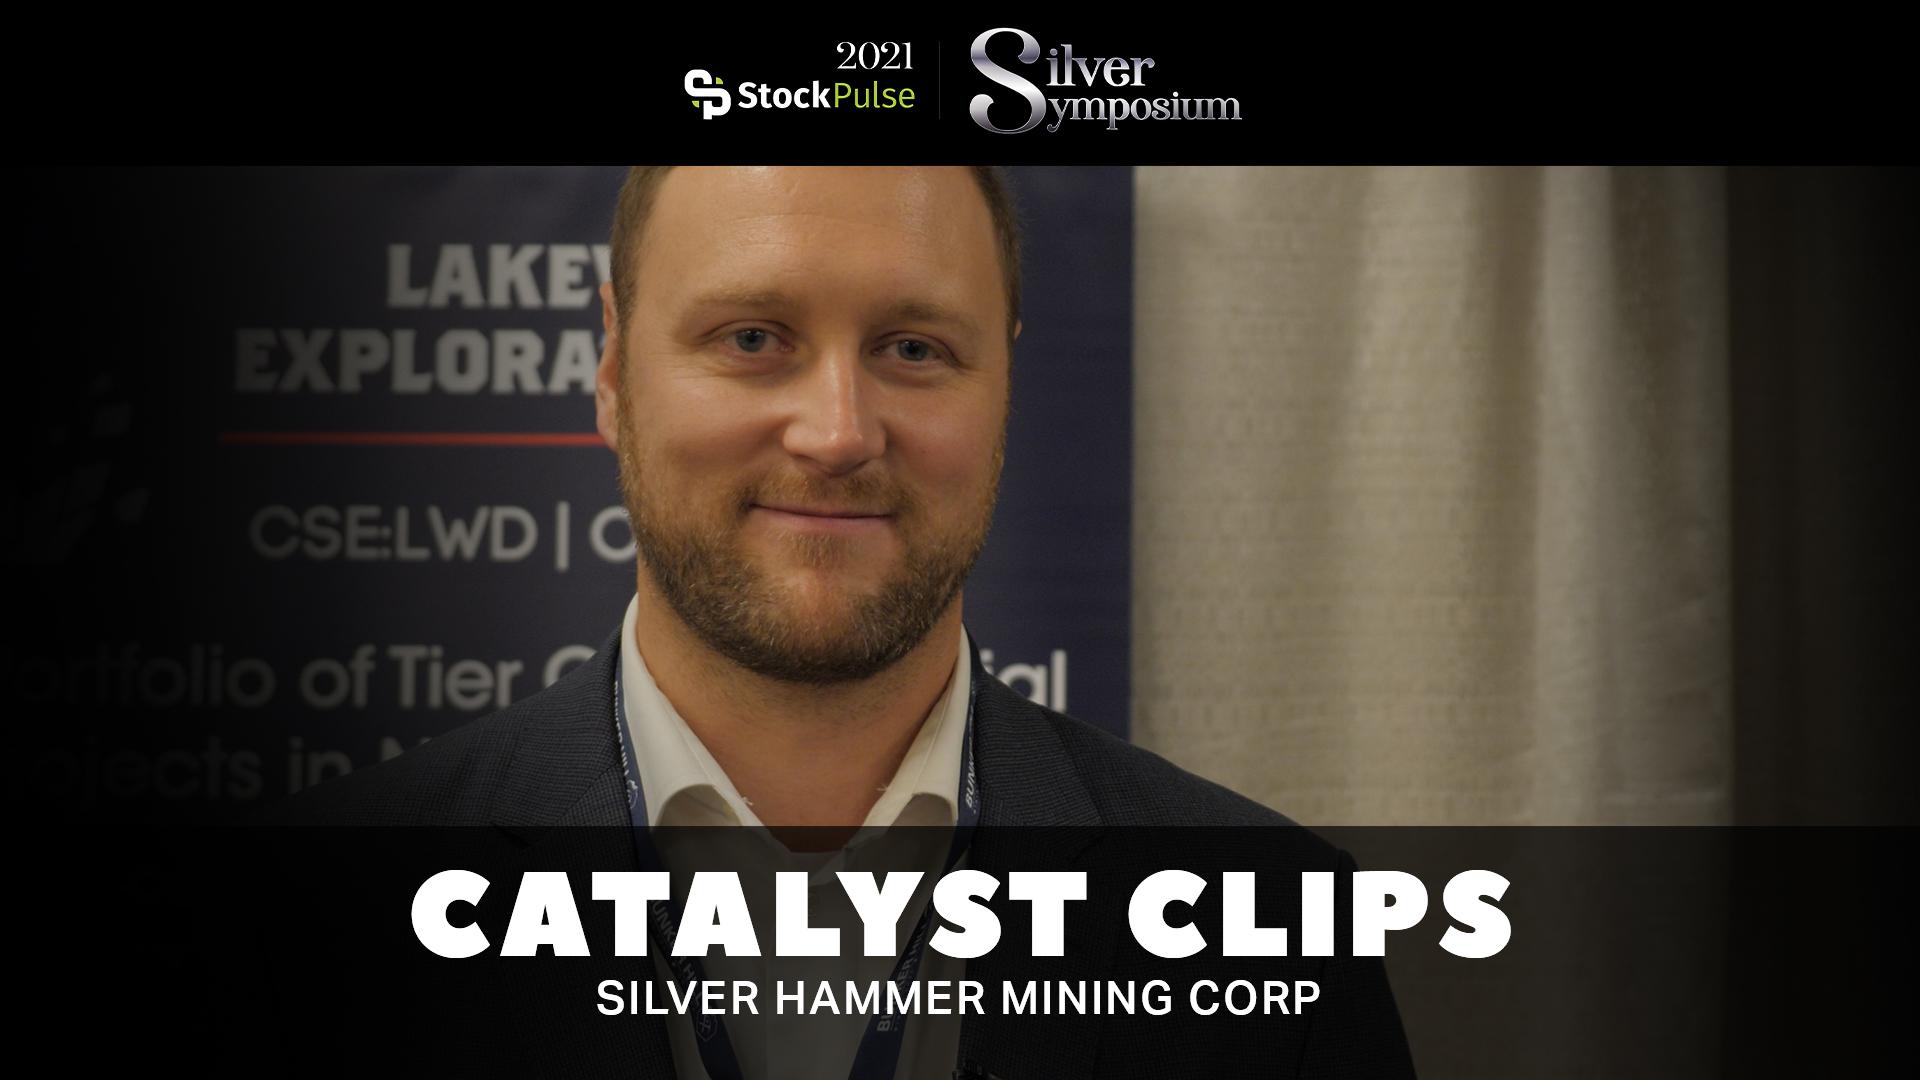 2021 StockPulse Silver Symposium Catalyst Clips | Morgan Lekstrom of Silver Hammer Mining Corp